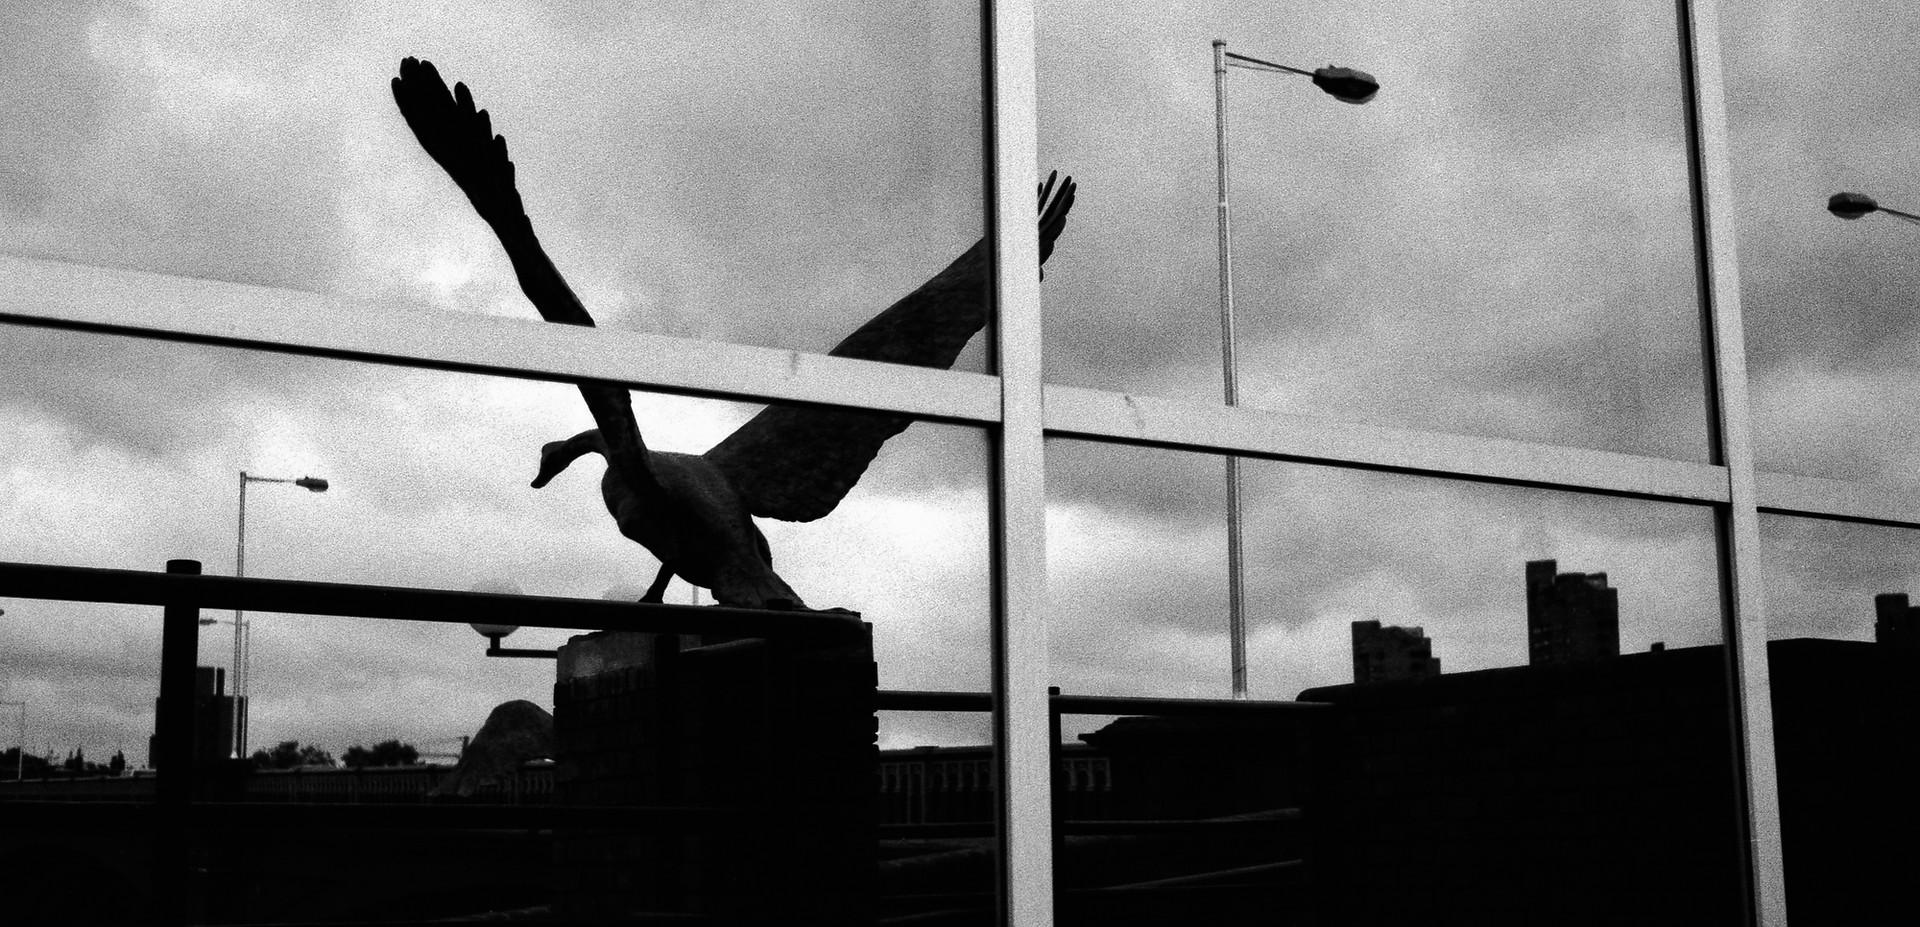 Battersea Bridge,_London, England 1985